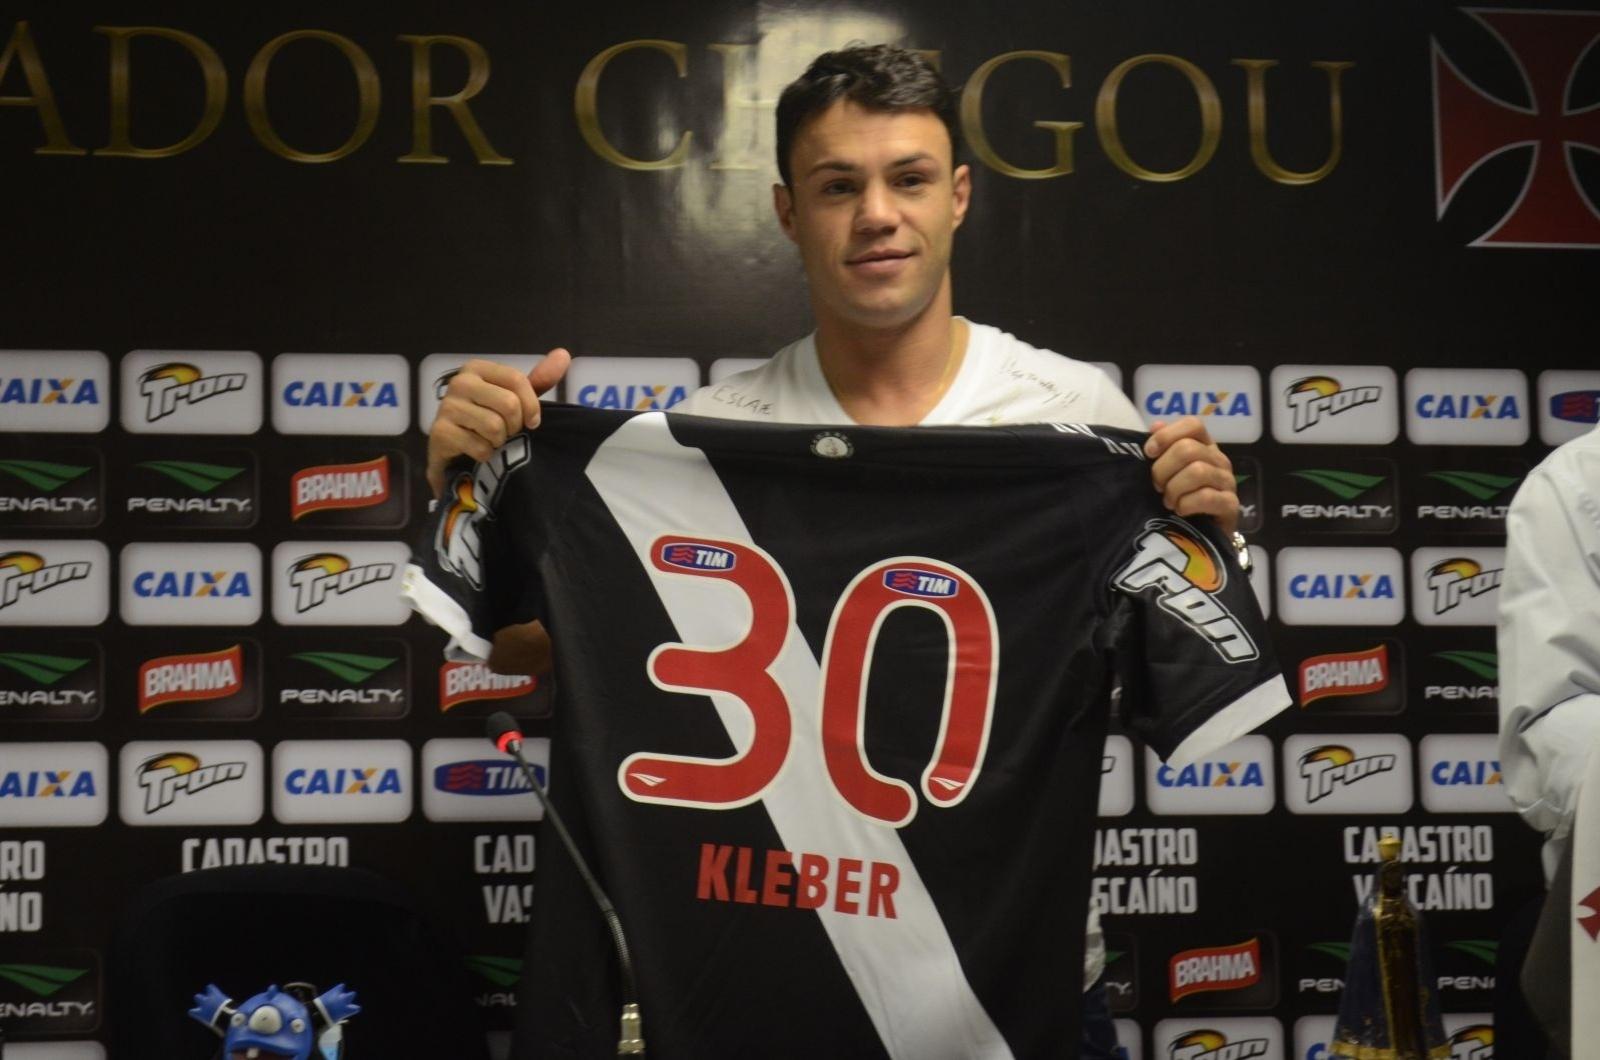 19.06.14 - O atacante Kléber foi apresentado pelo Vasco nesta quinta-feira